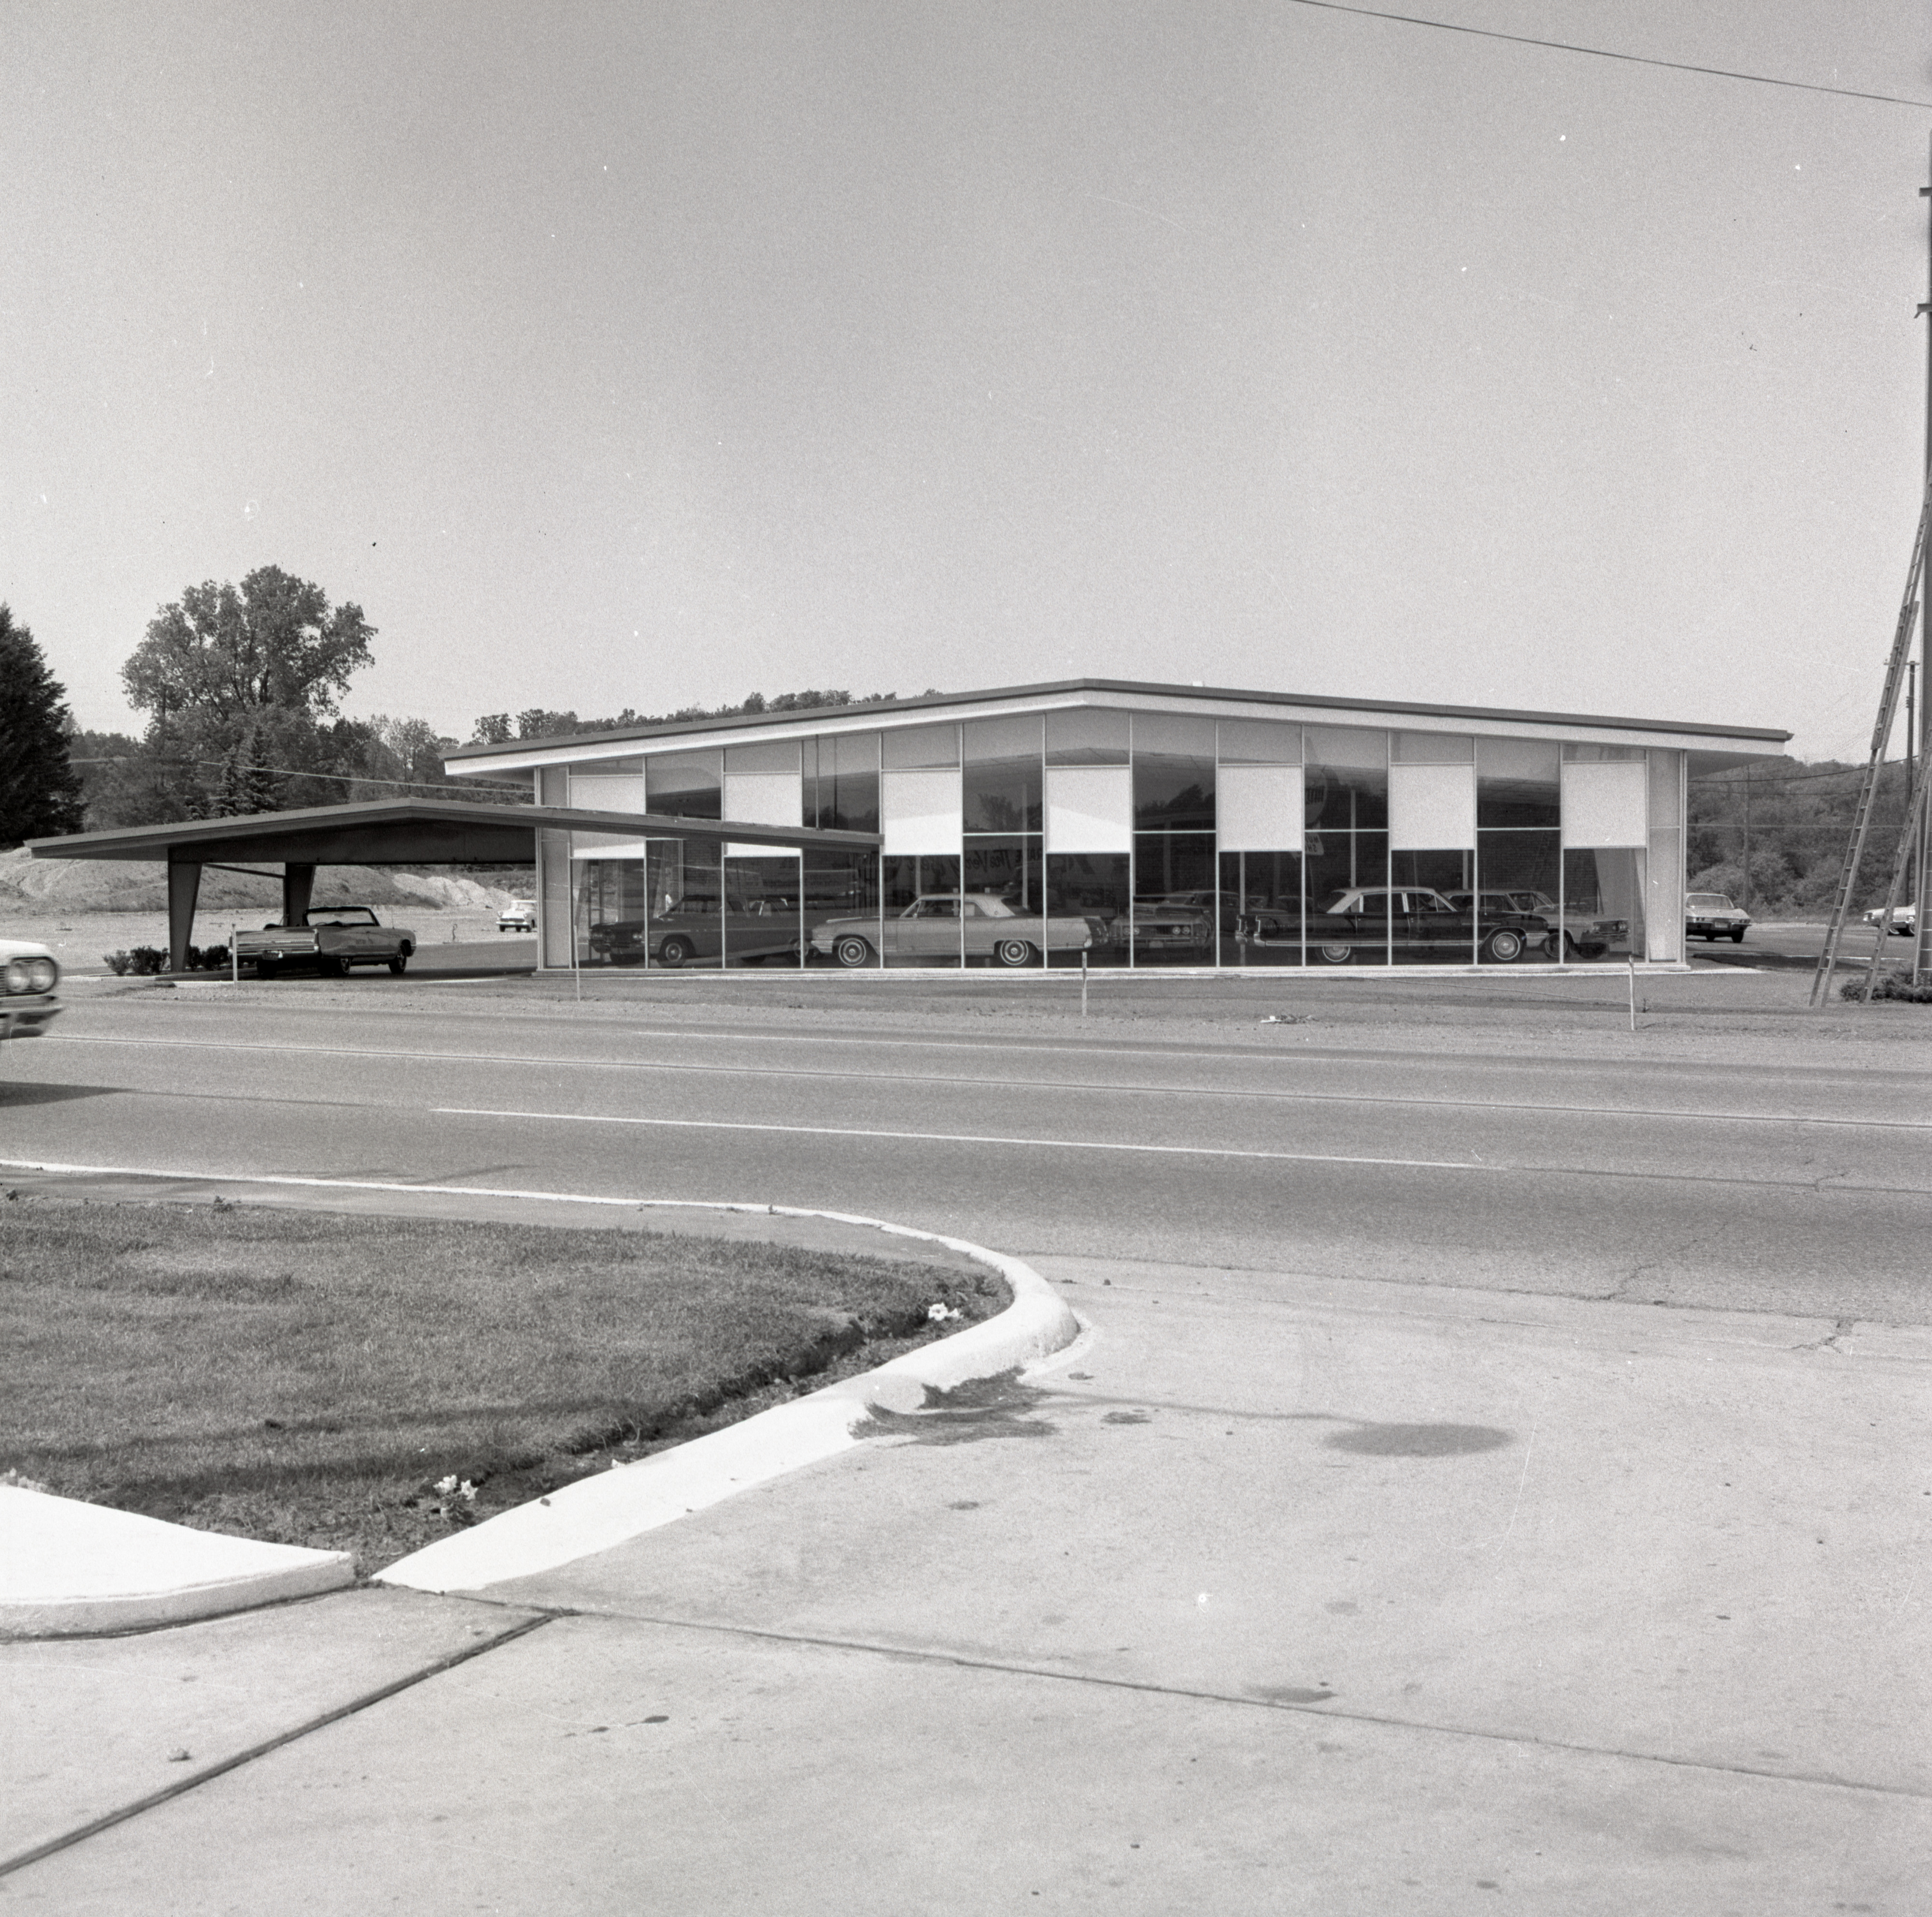 ann arbor buick - 3165 washtenaw, june 1964 | ann arbor district library